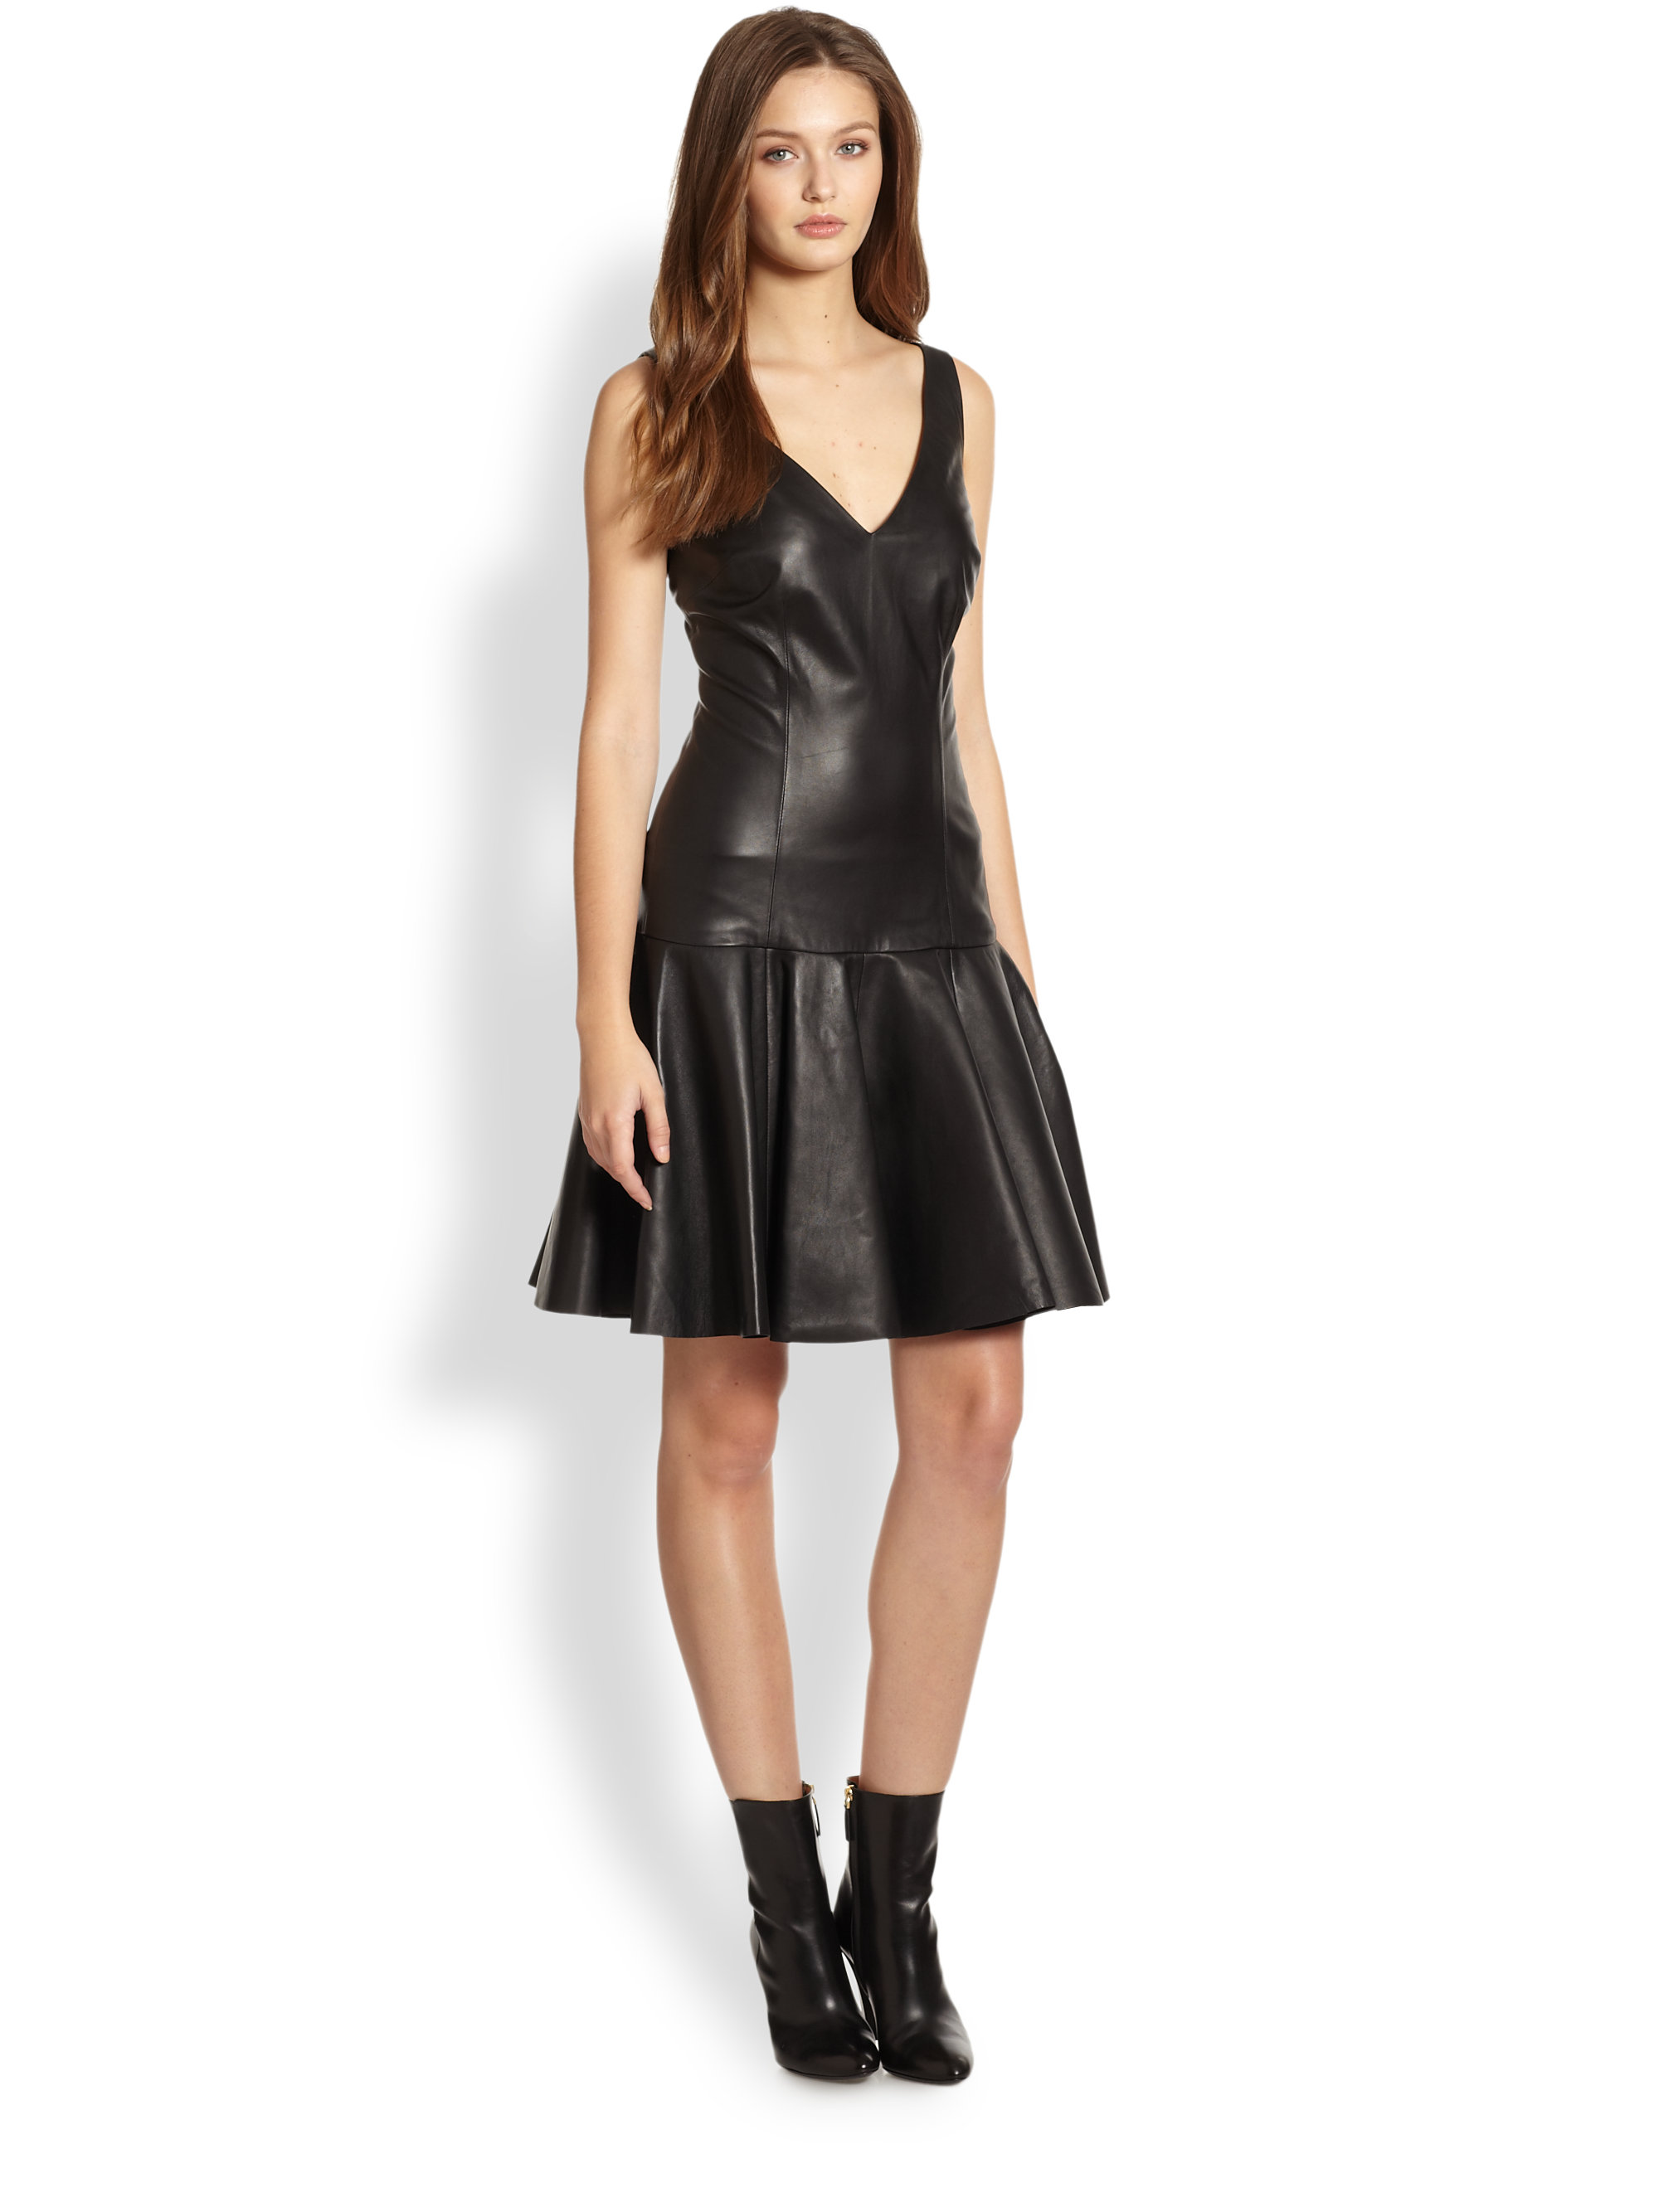 Ralph Lauren Blue Label Stasya Leather Dropwaist Dress In